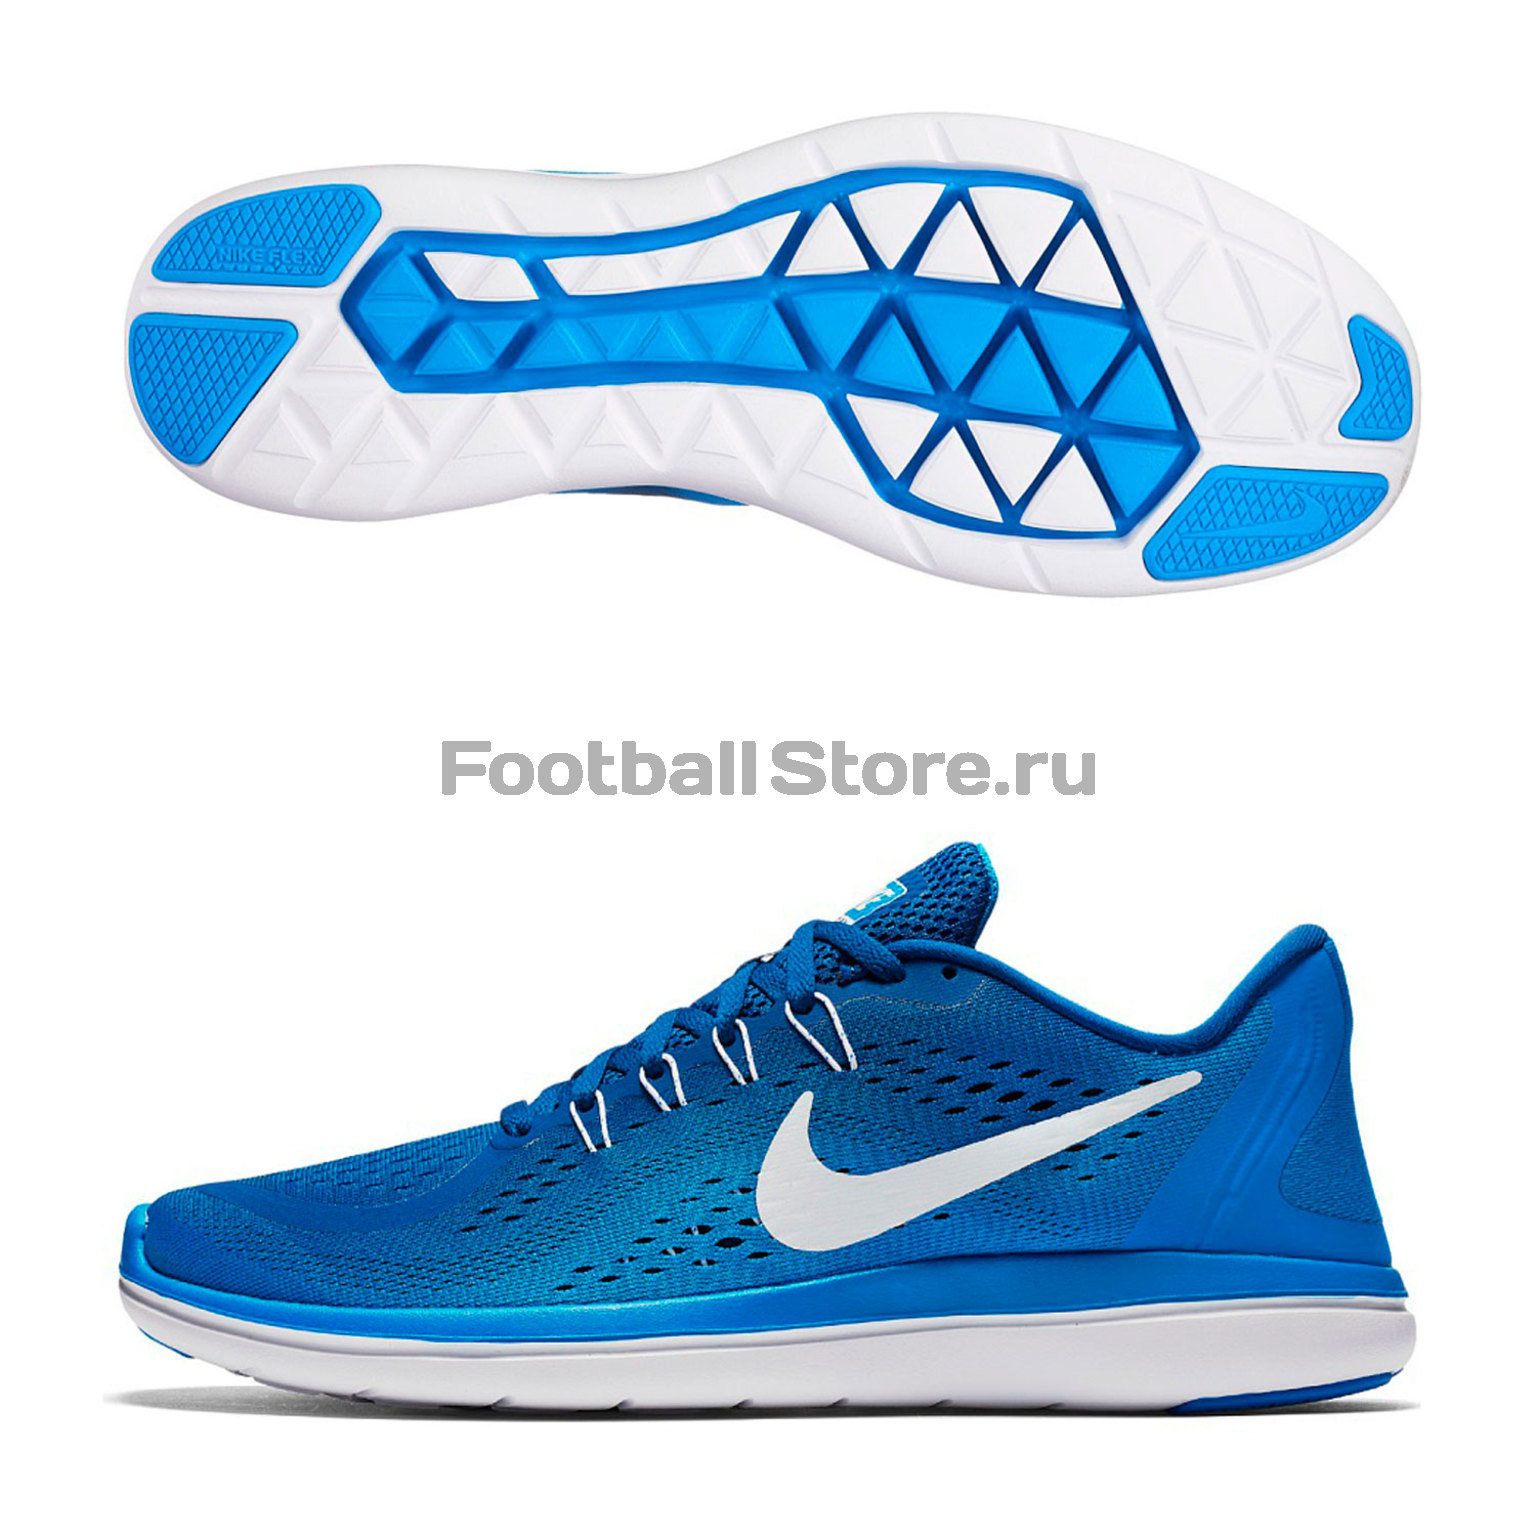 Кроссовки Nike Flex 2017 RN 898457-403 кроссовки nike flex show tr 525729 007 022